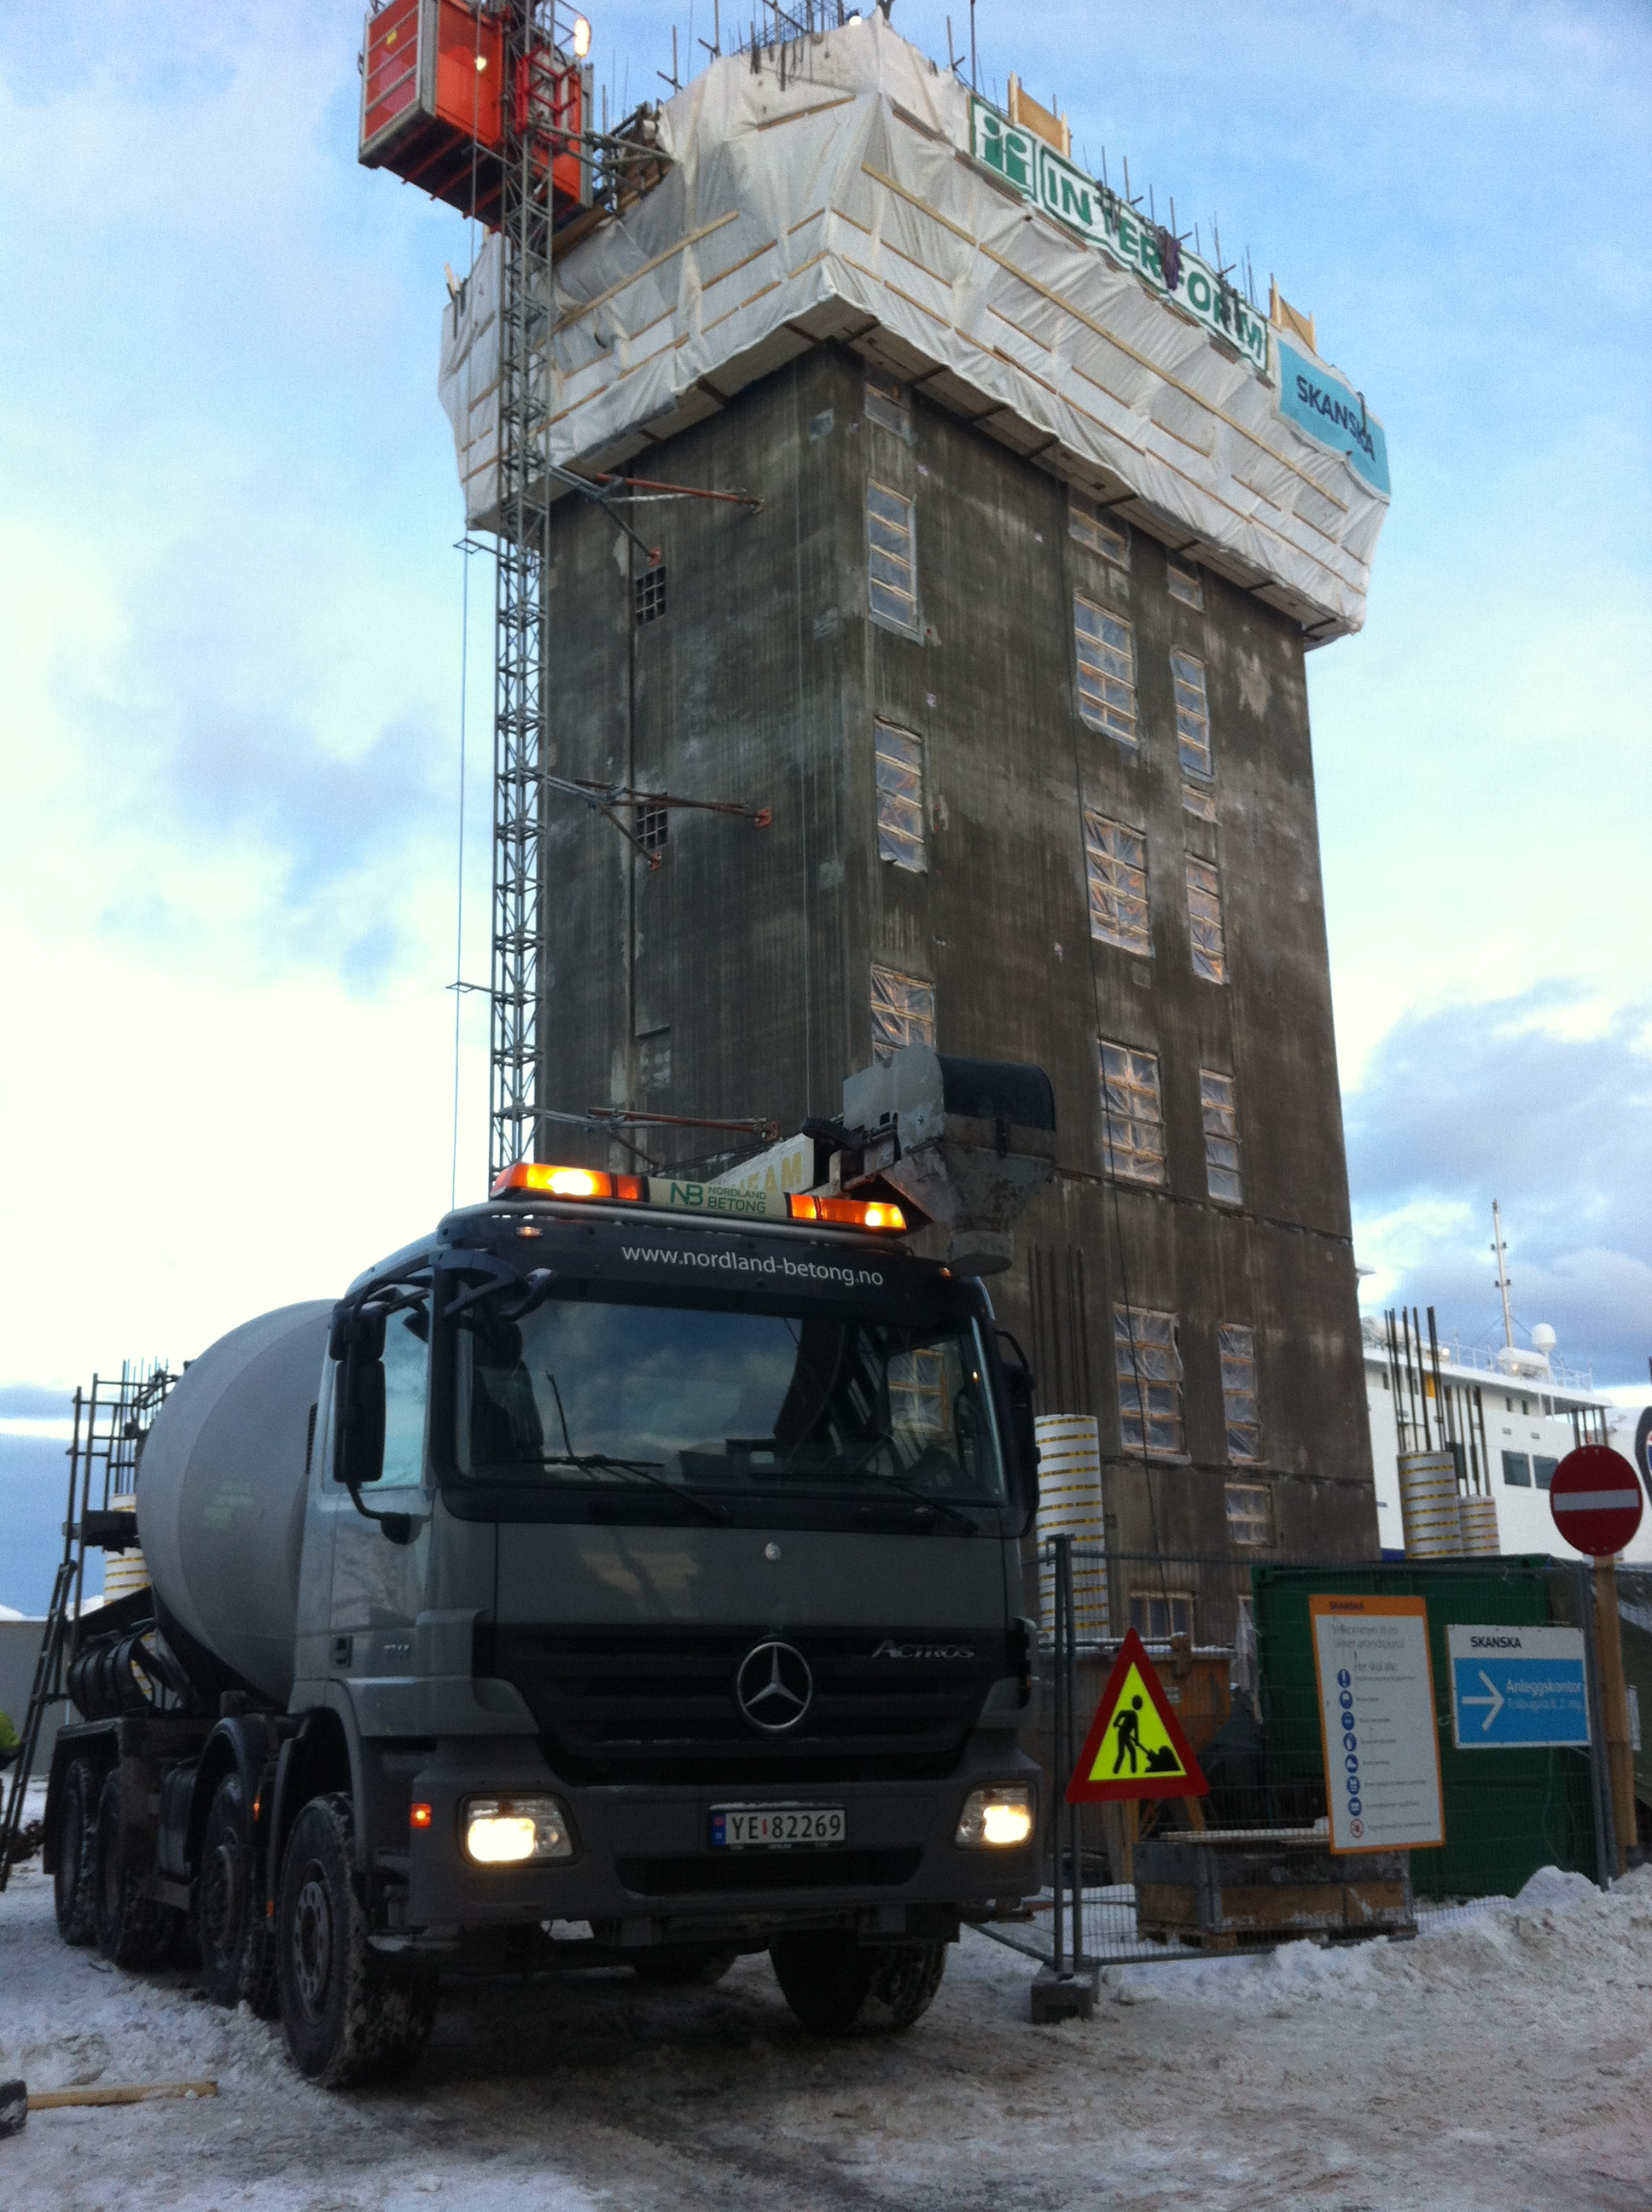 Nordland betong burøya